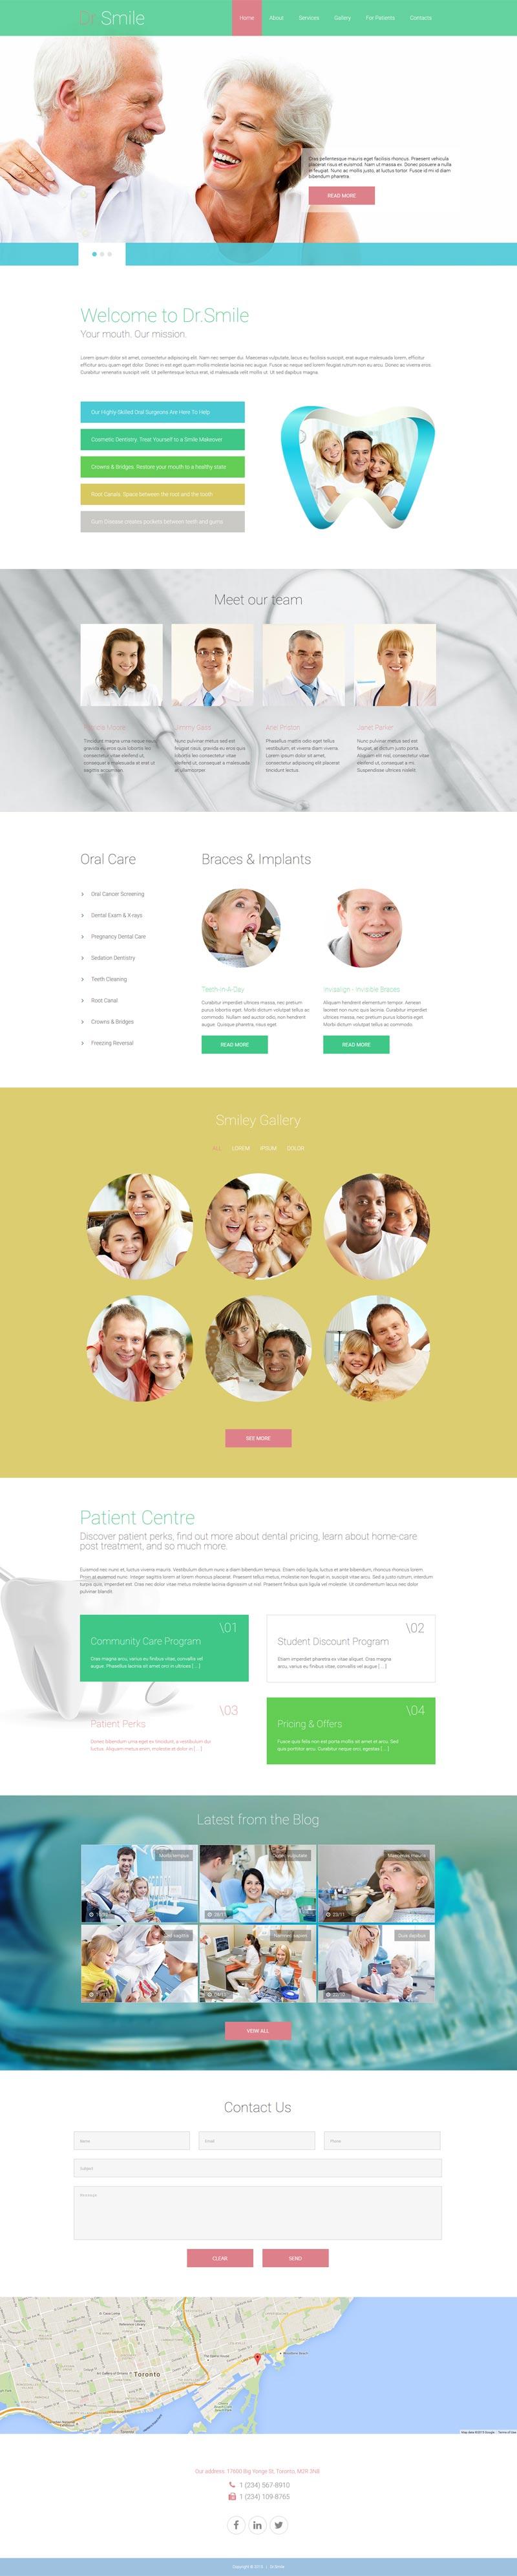 Doctor Smile Joomla! template